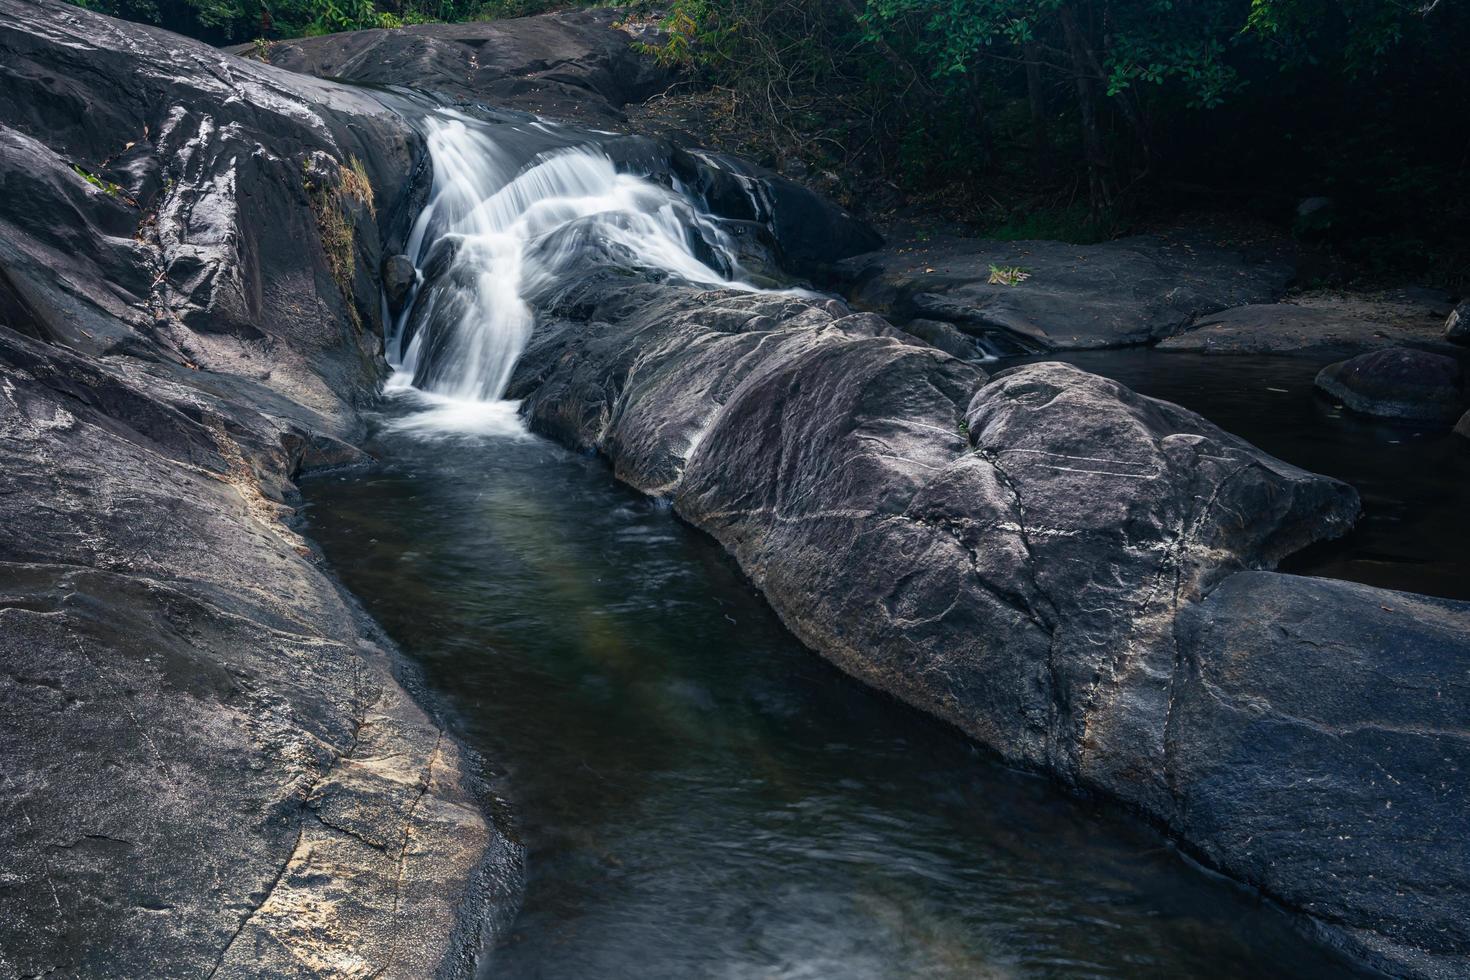 khlong pla kang vattenfall i Thailand foto